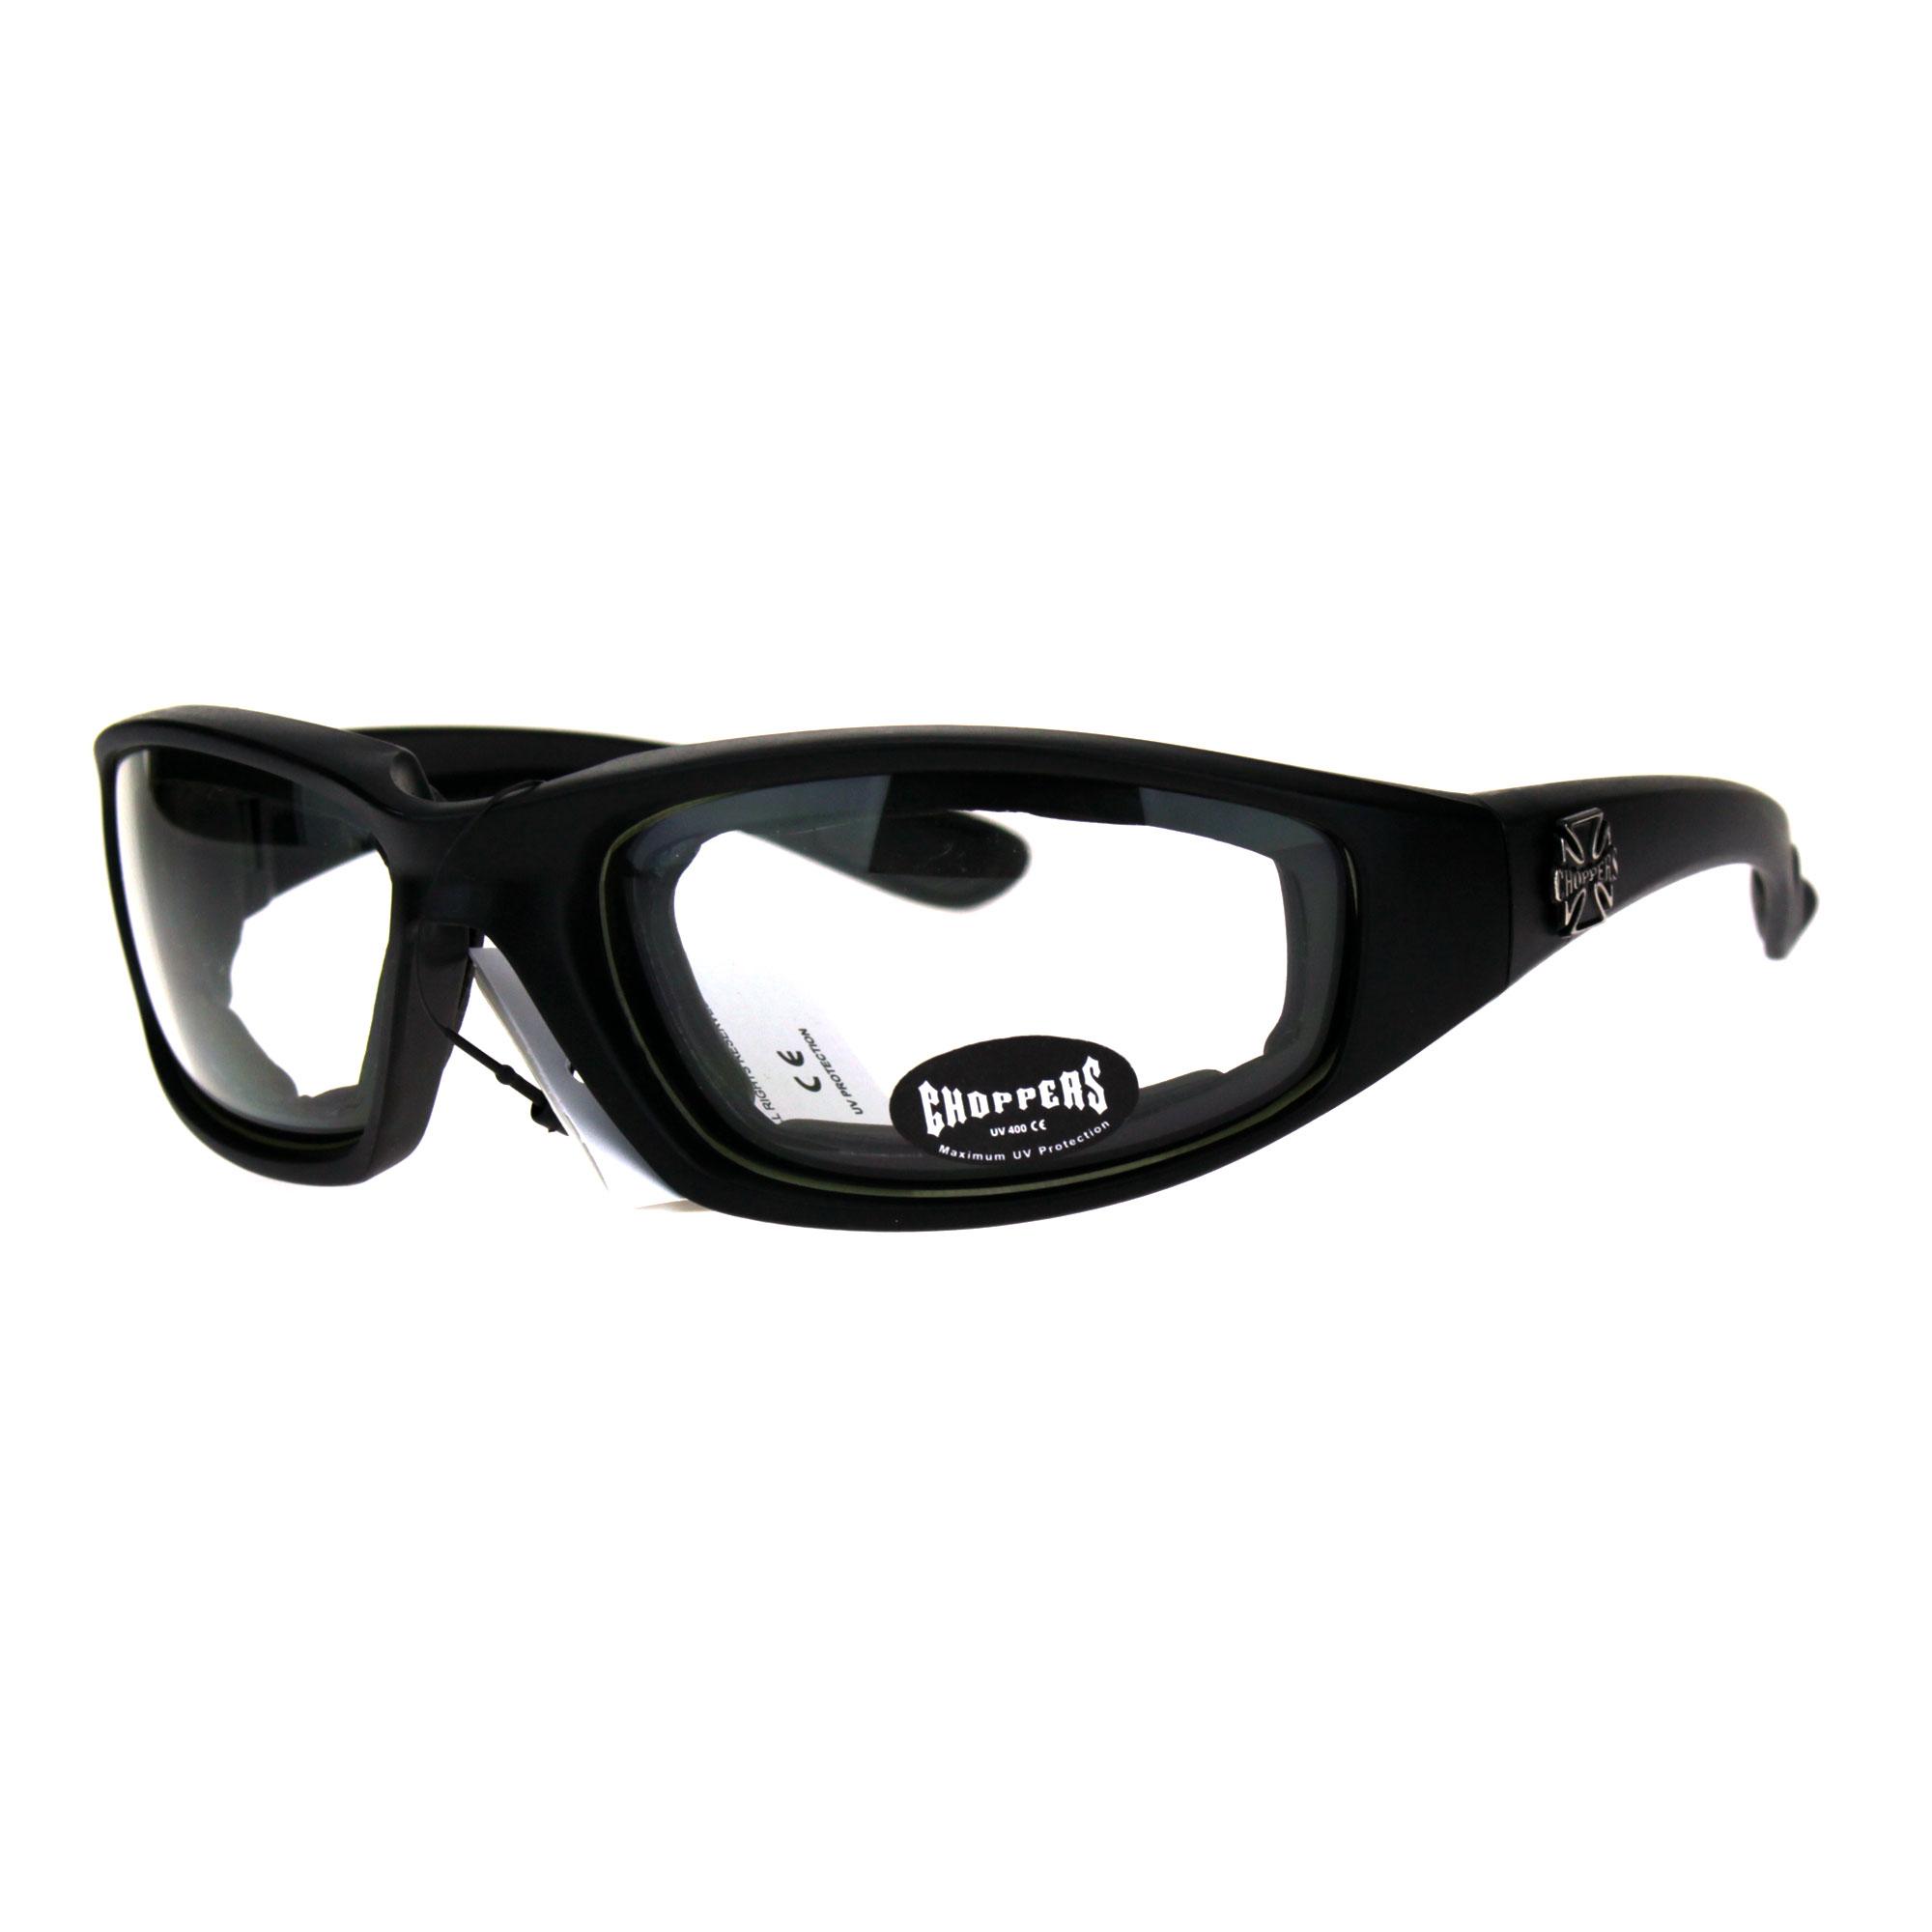 d6a3a48d3a00 Motorcycle Riding Sunglasses For Men